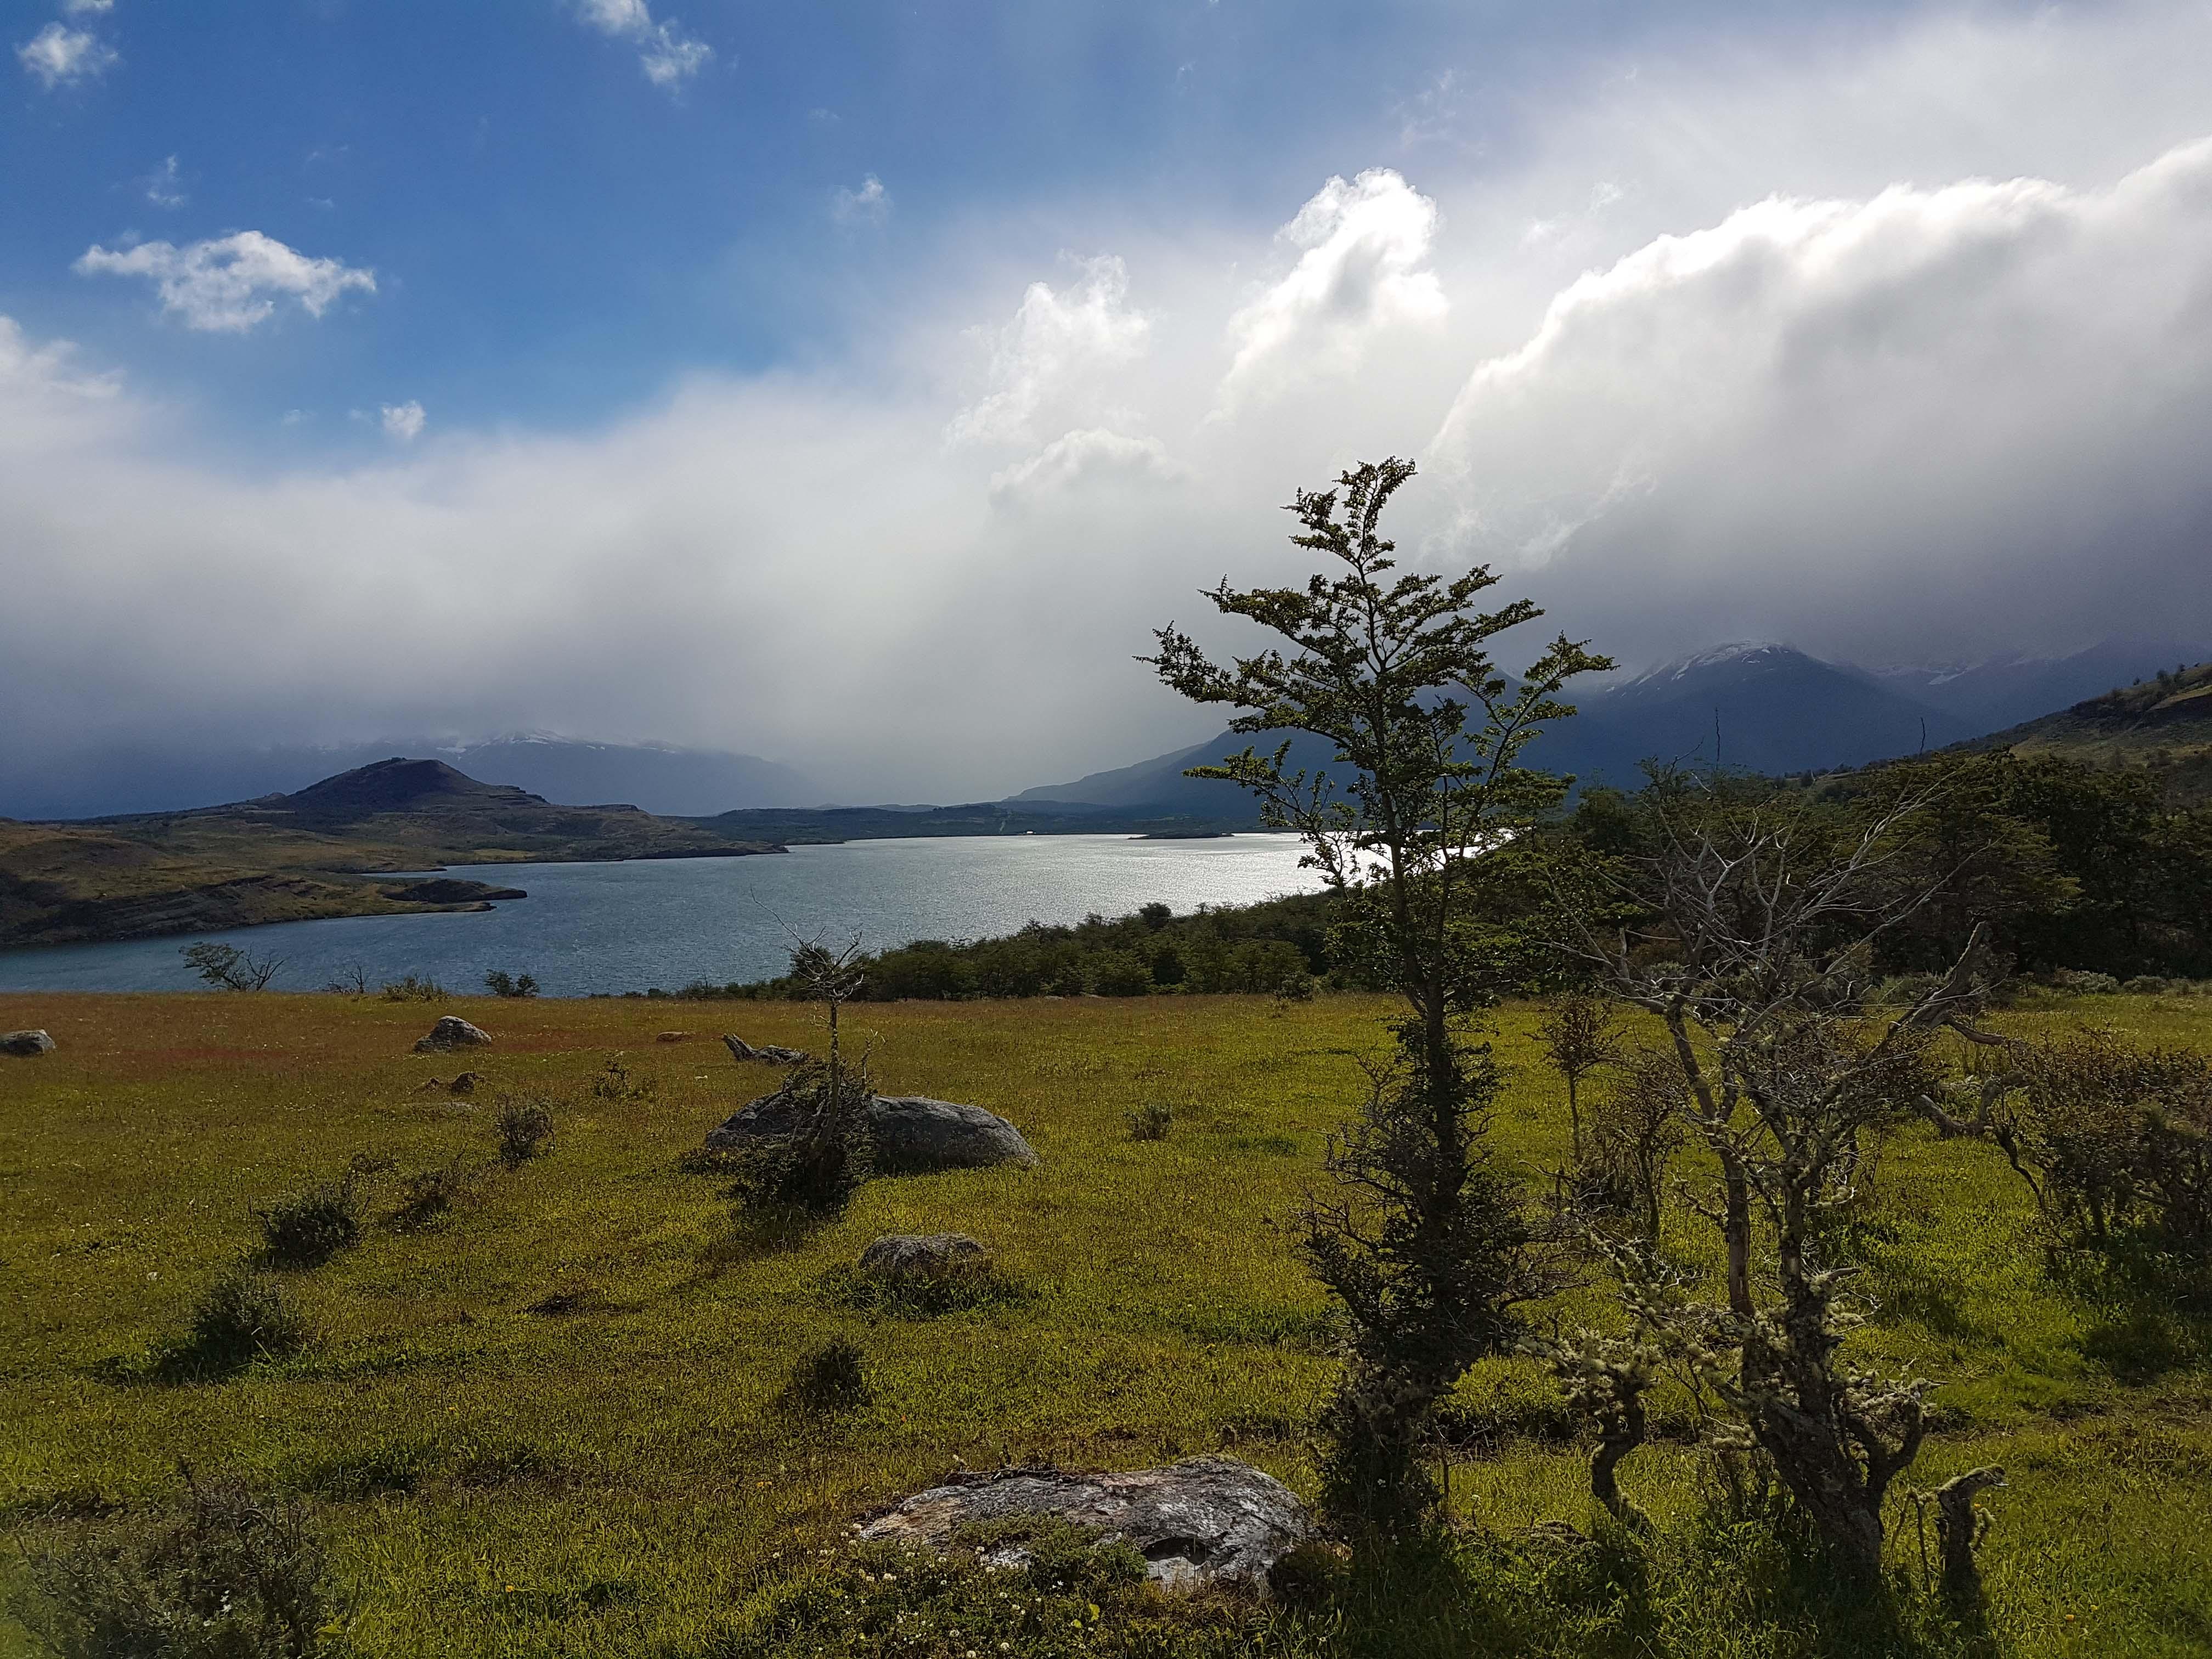 CHILE: Pingo Salvaje